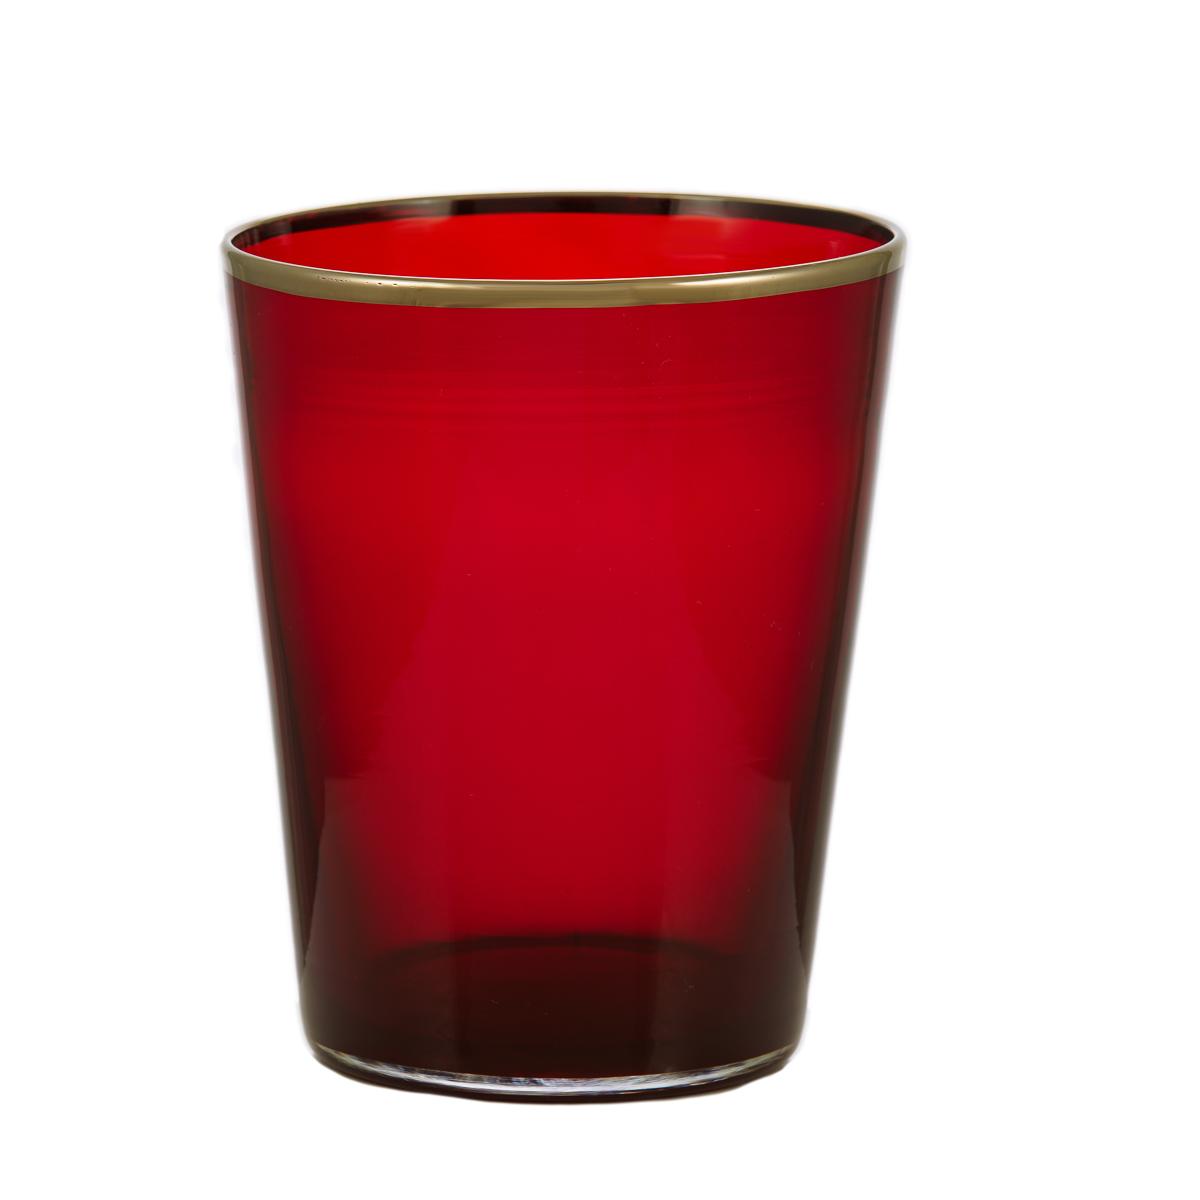 vaso-glass-giberto-colorful-platinum-red-passion-luxury-design-venice